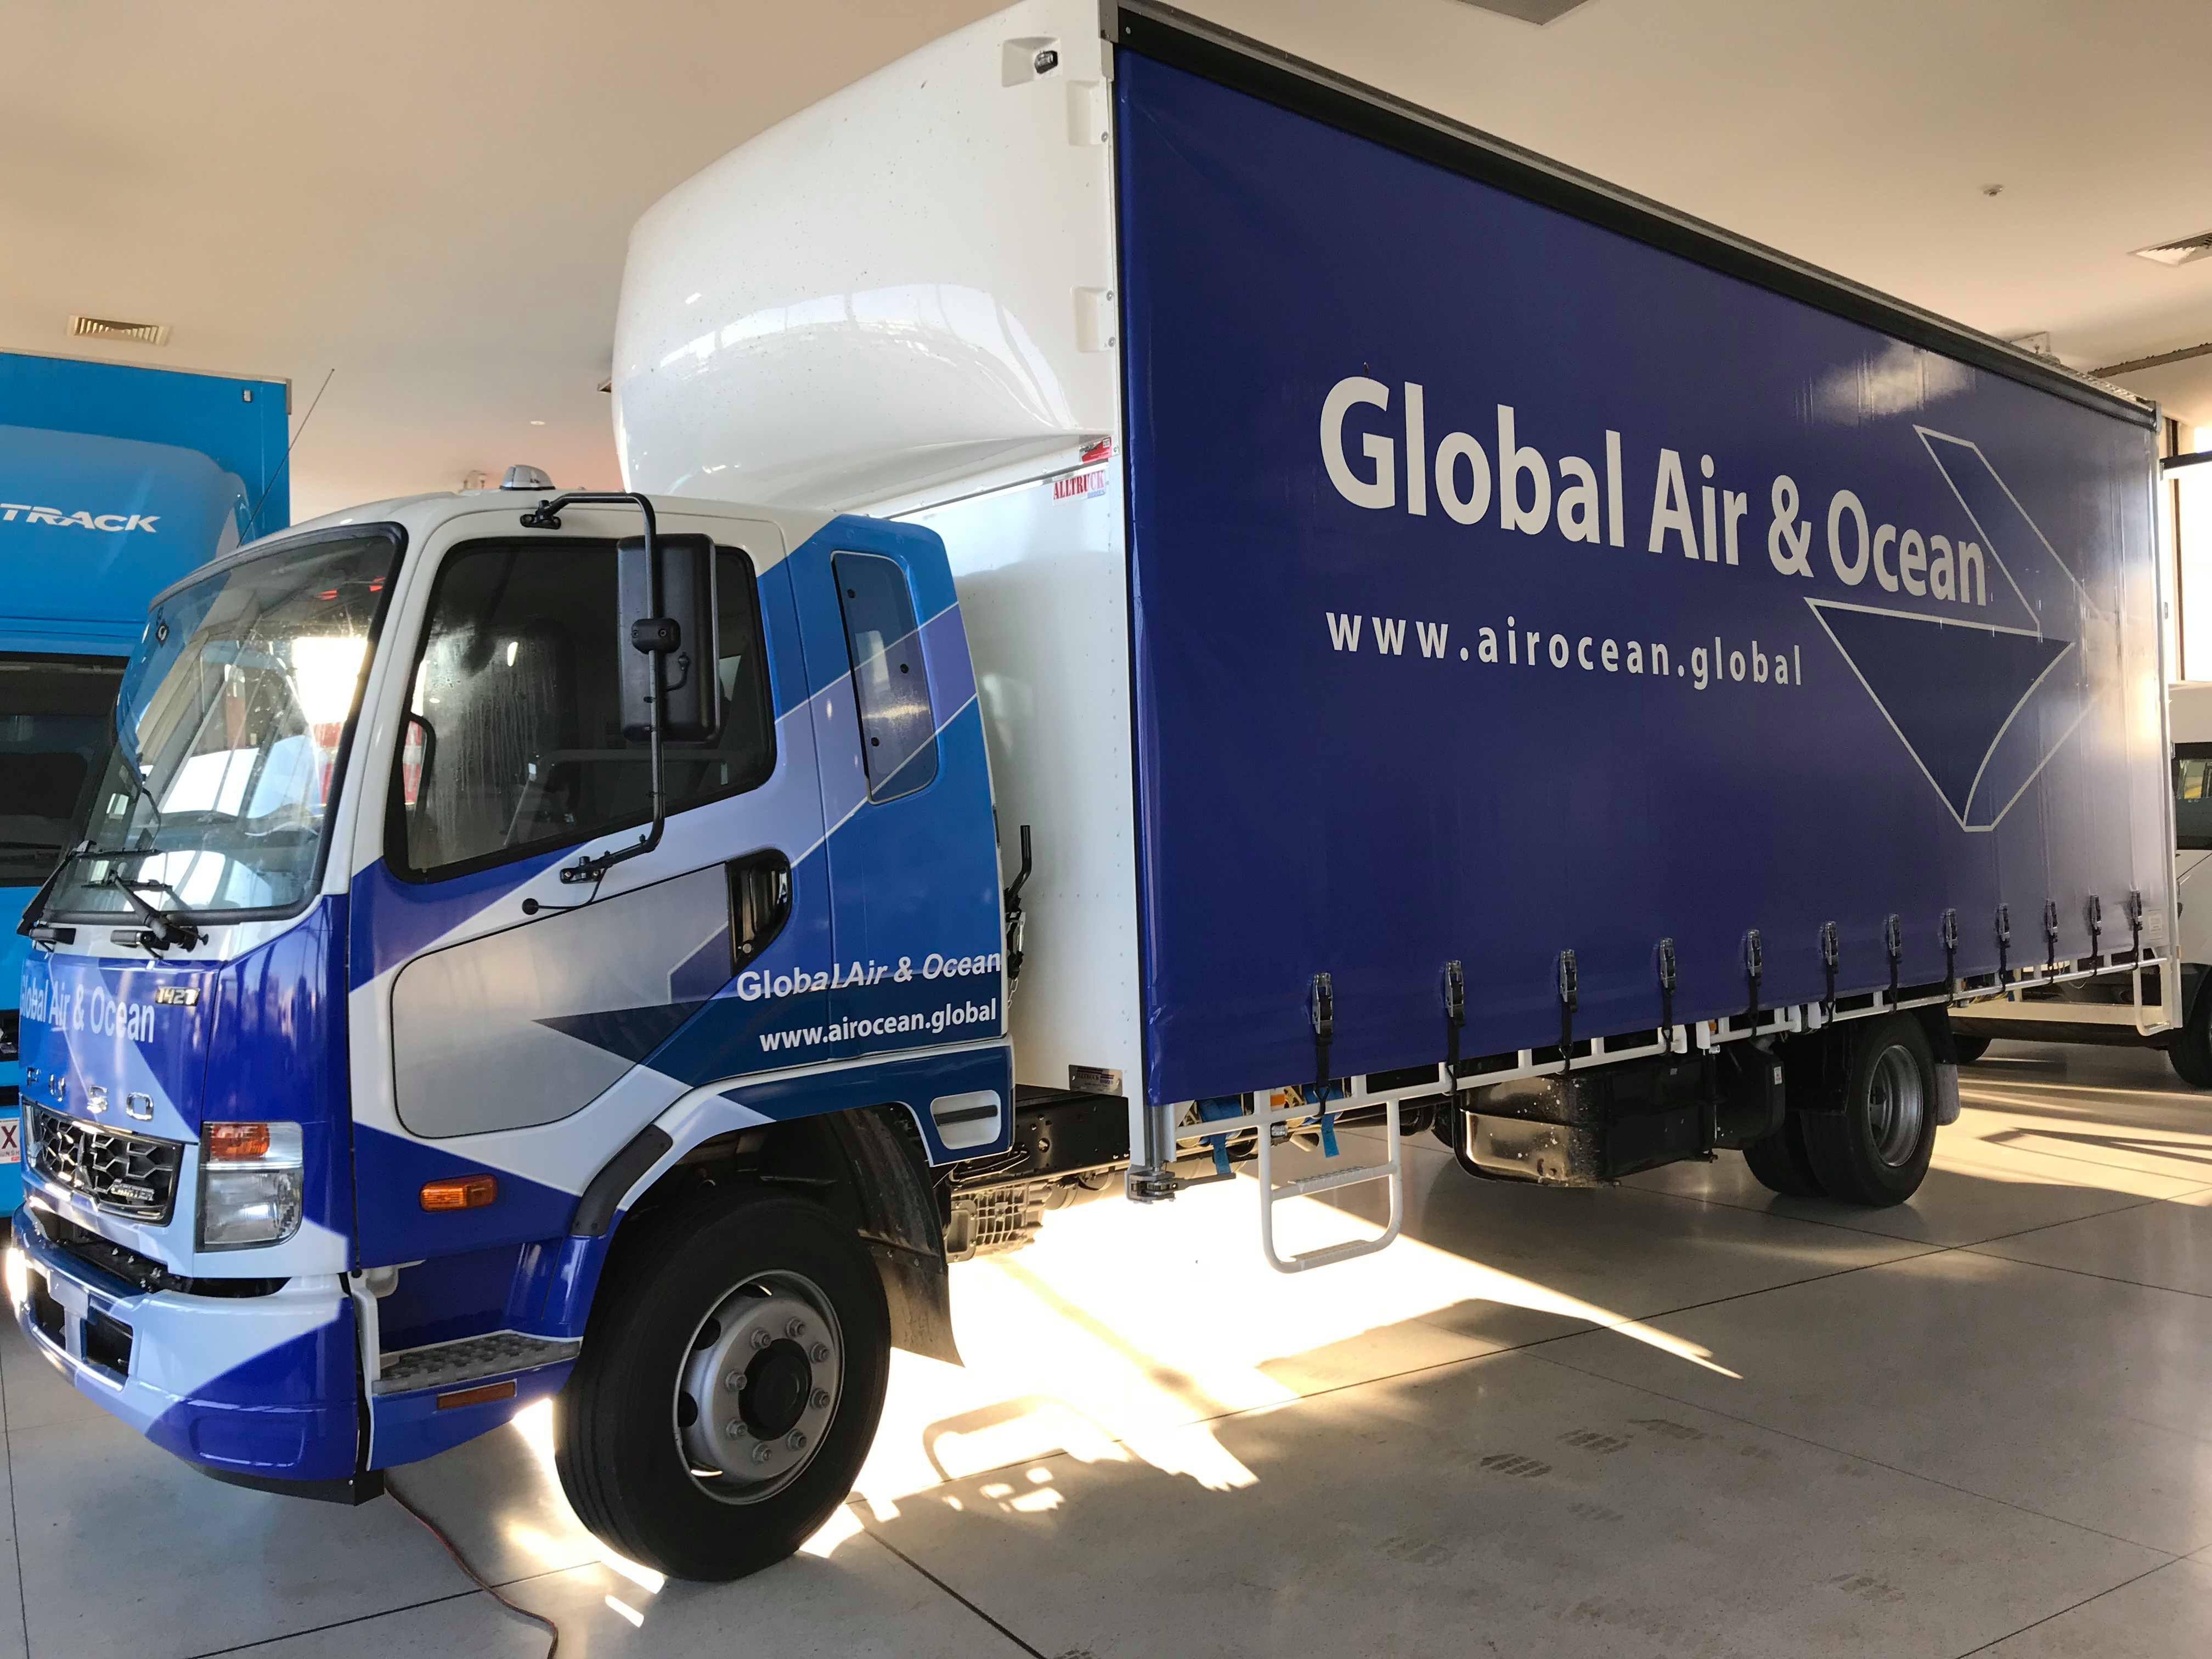 Global Air & Ocean